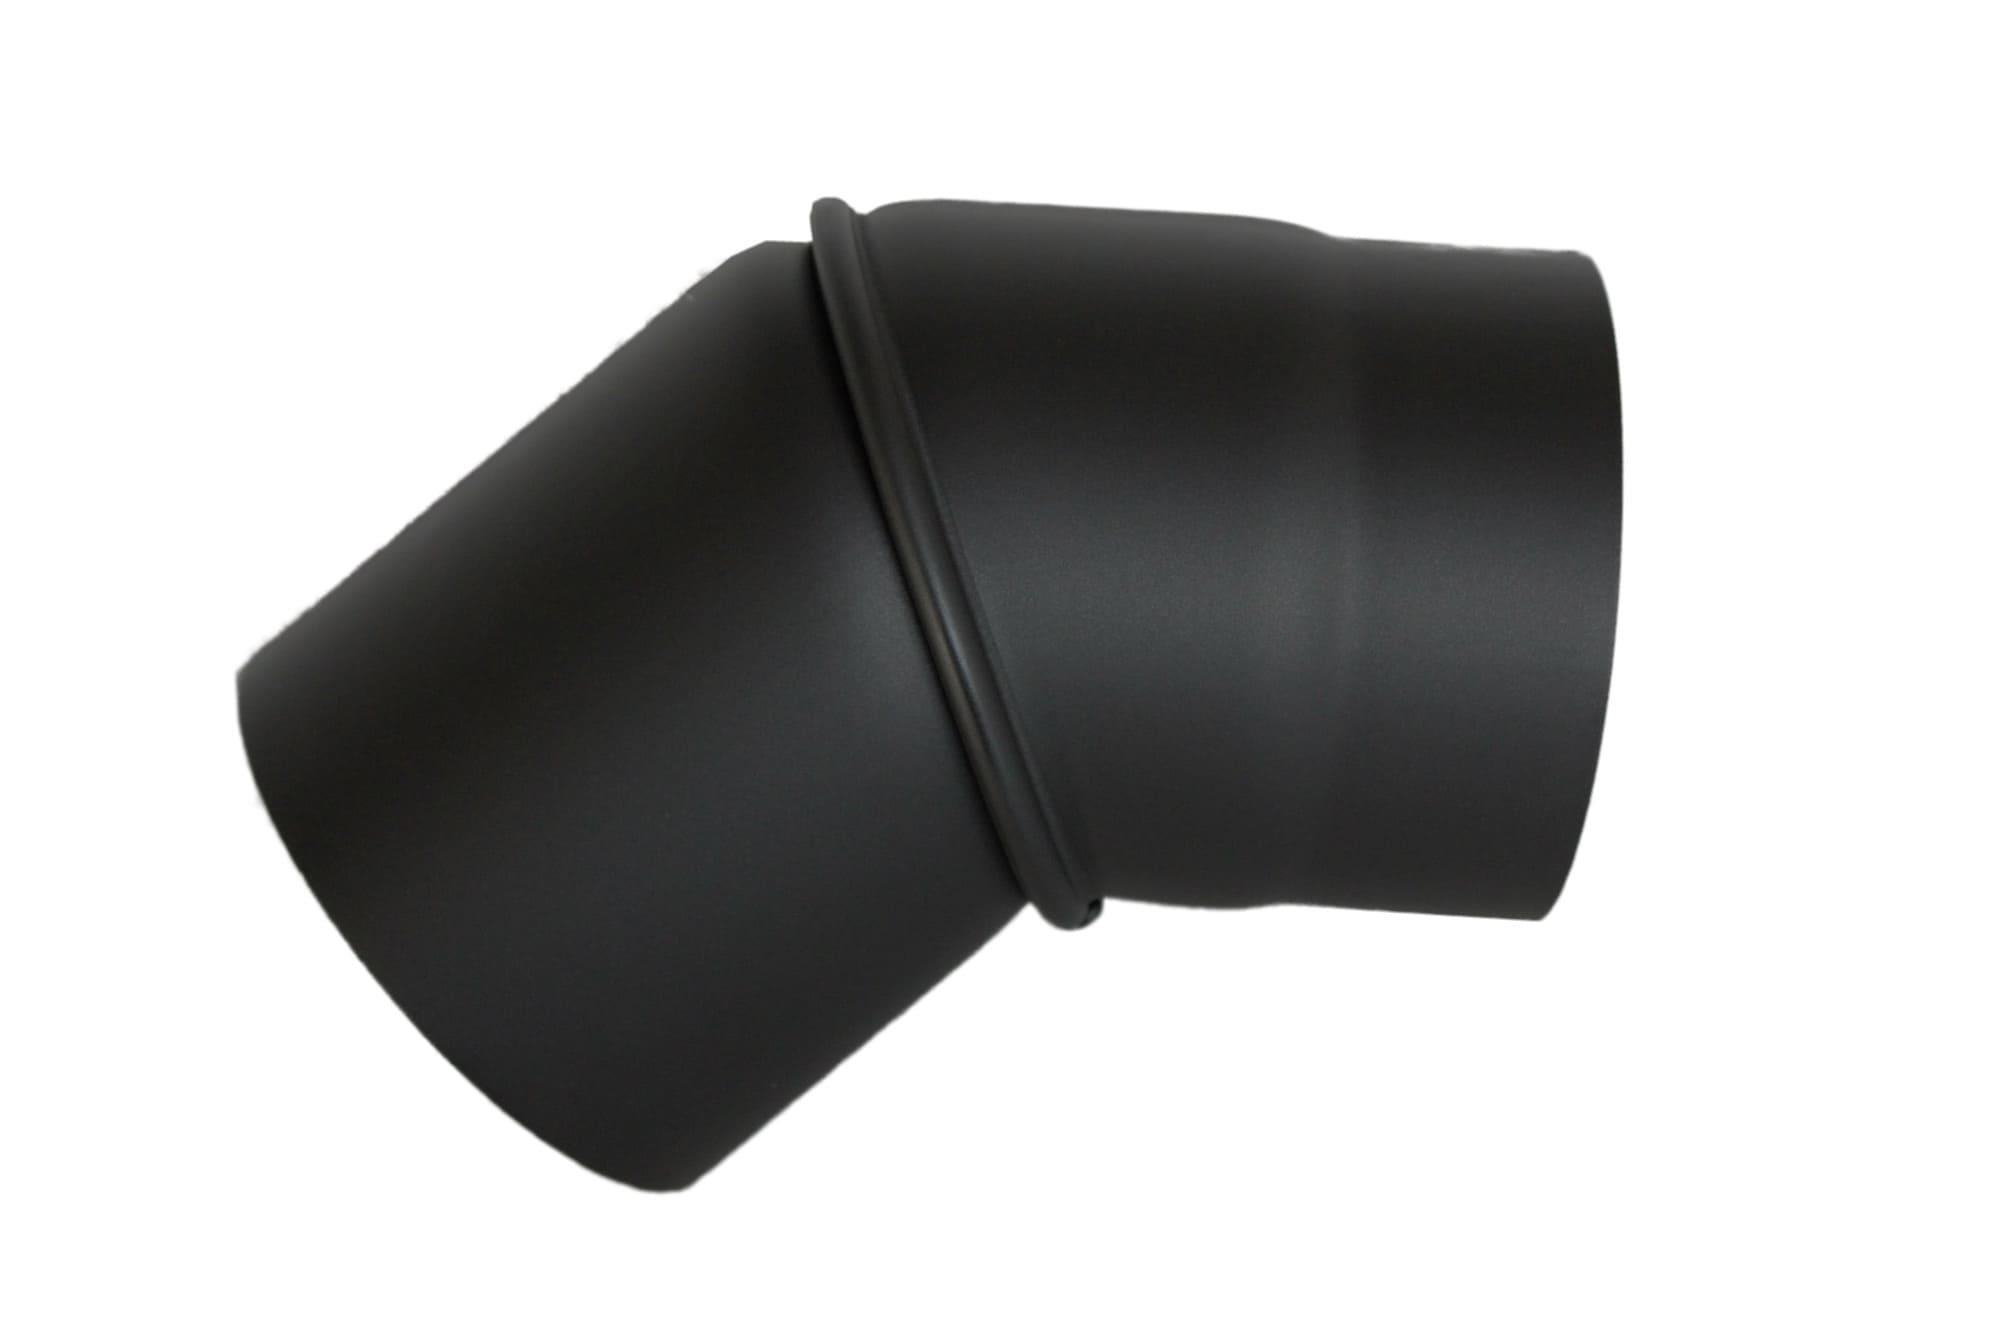 Ofenrohr Ø 120 mmschwarzRohrbogenverstellbar